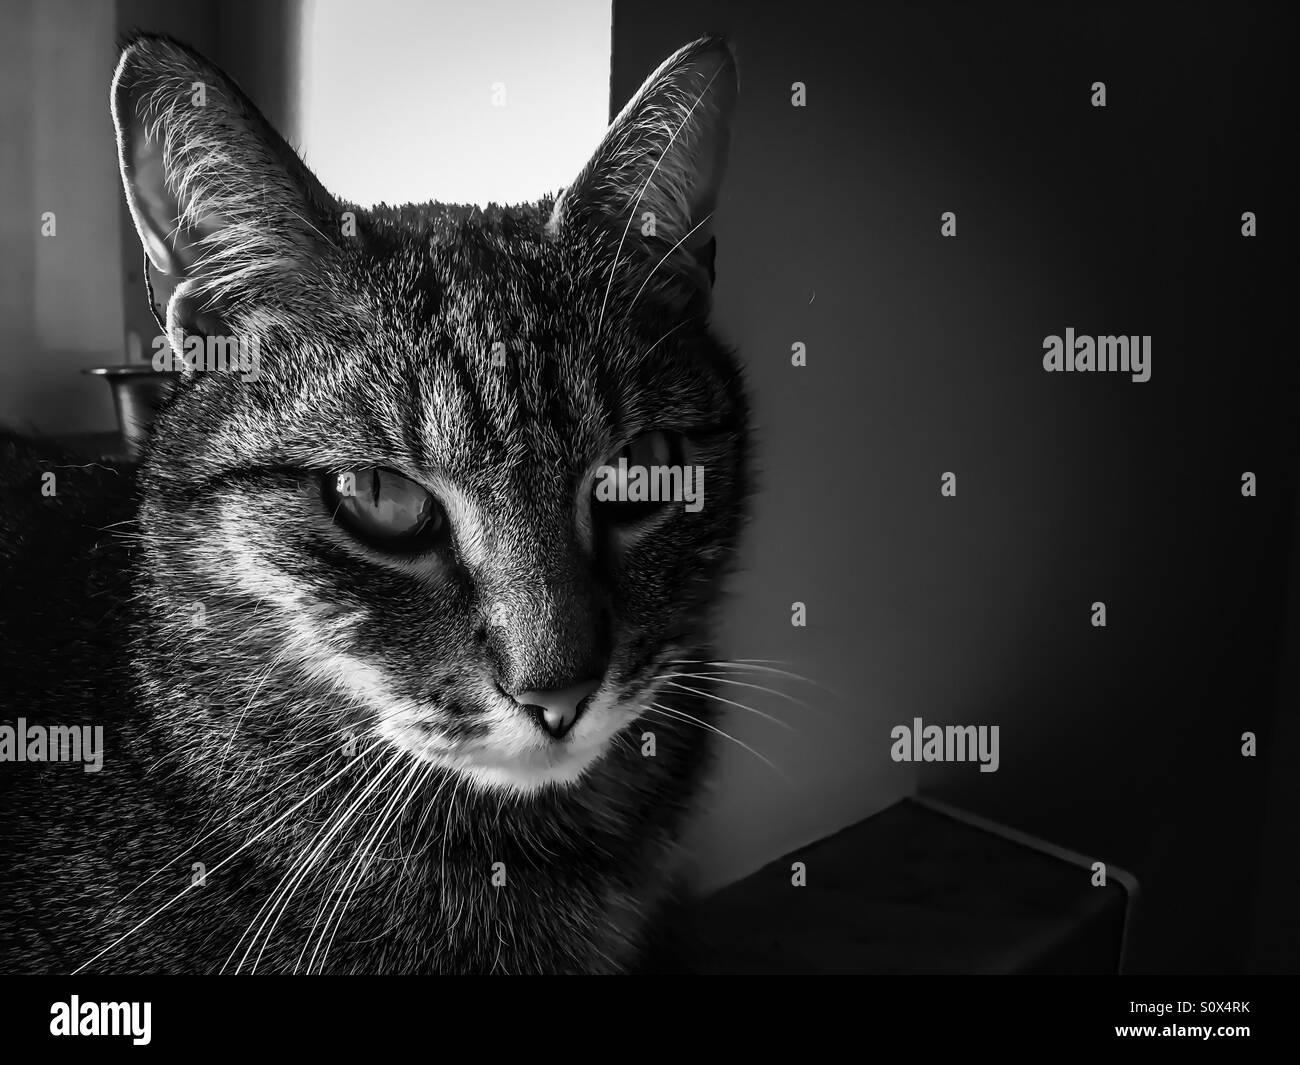 Gato Gris en fondo blanco-negro Imagen De Stock